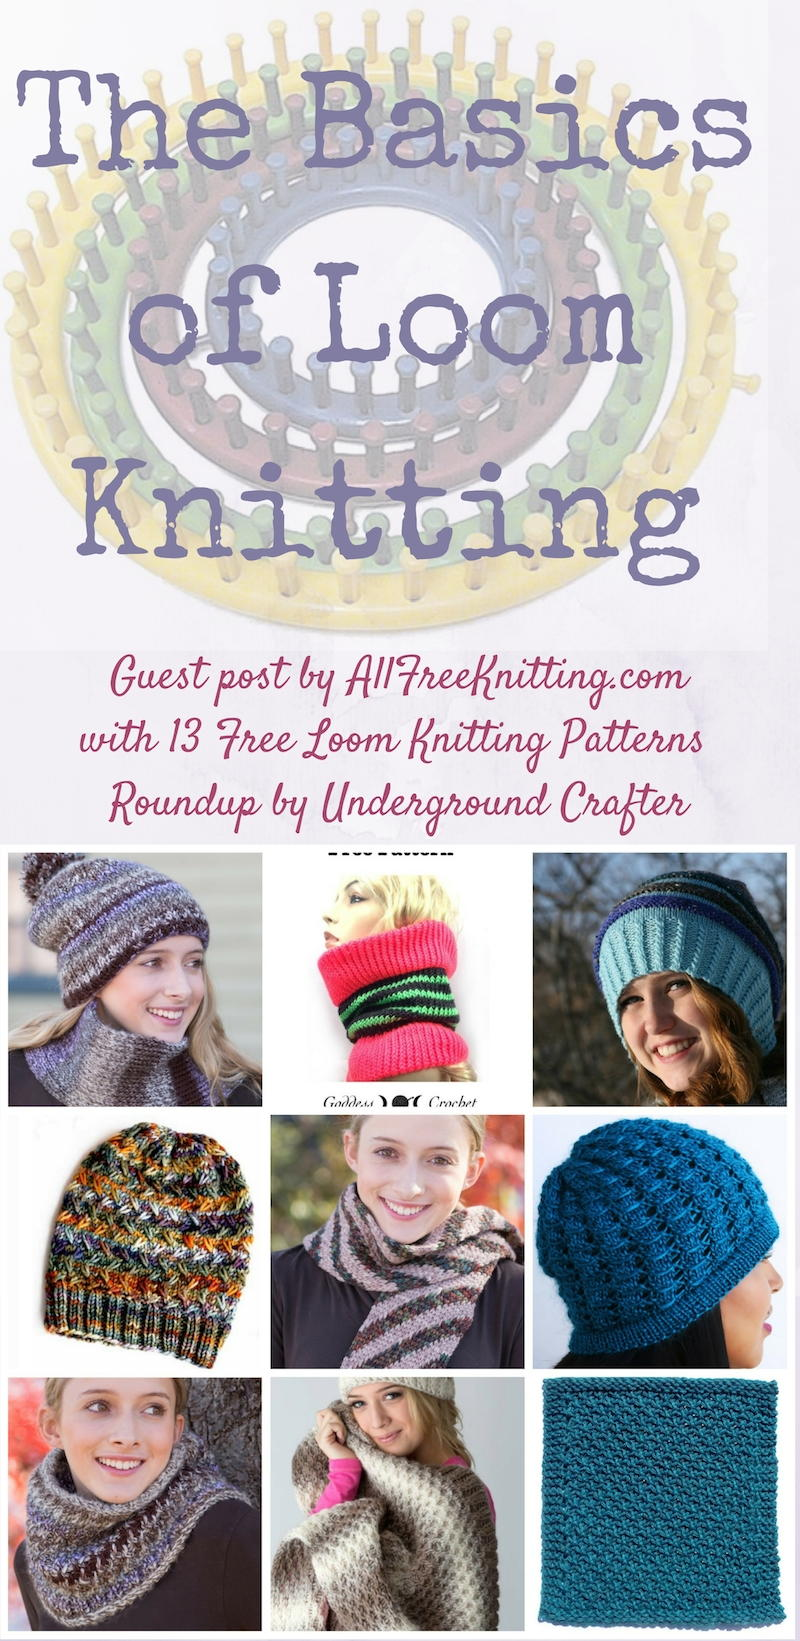 Basics Of Loom Knitting With 13 Free Loom Knitting Patterns